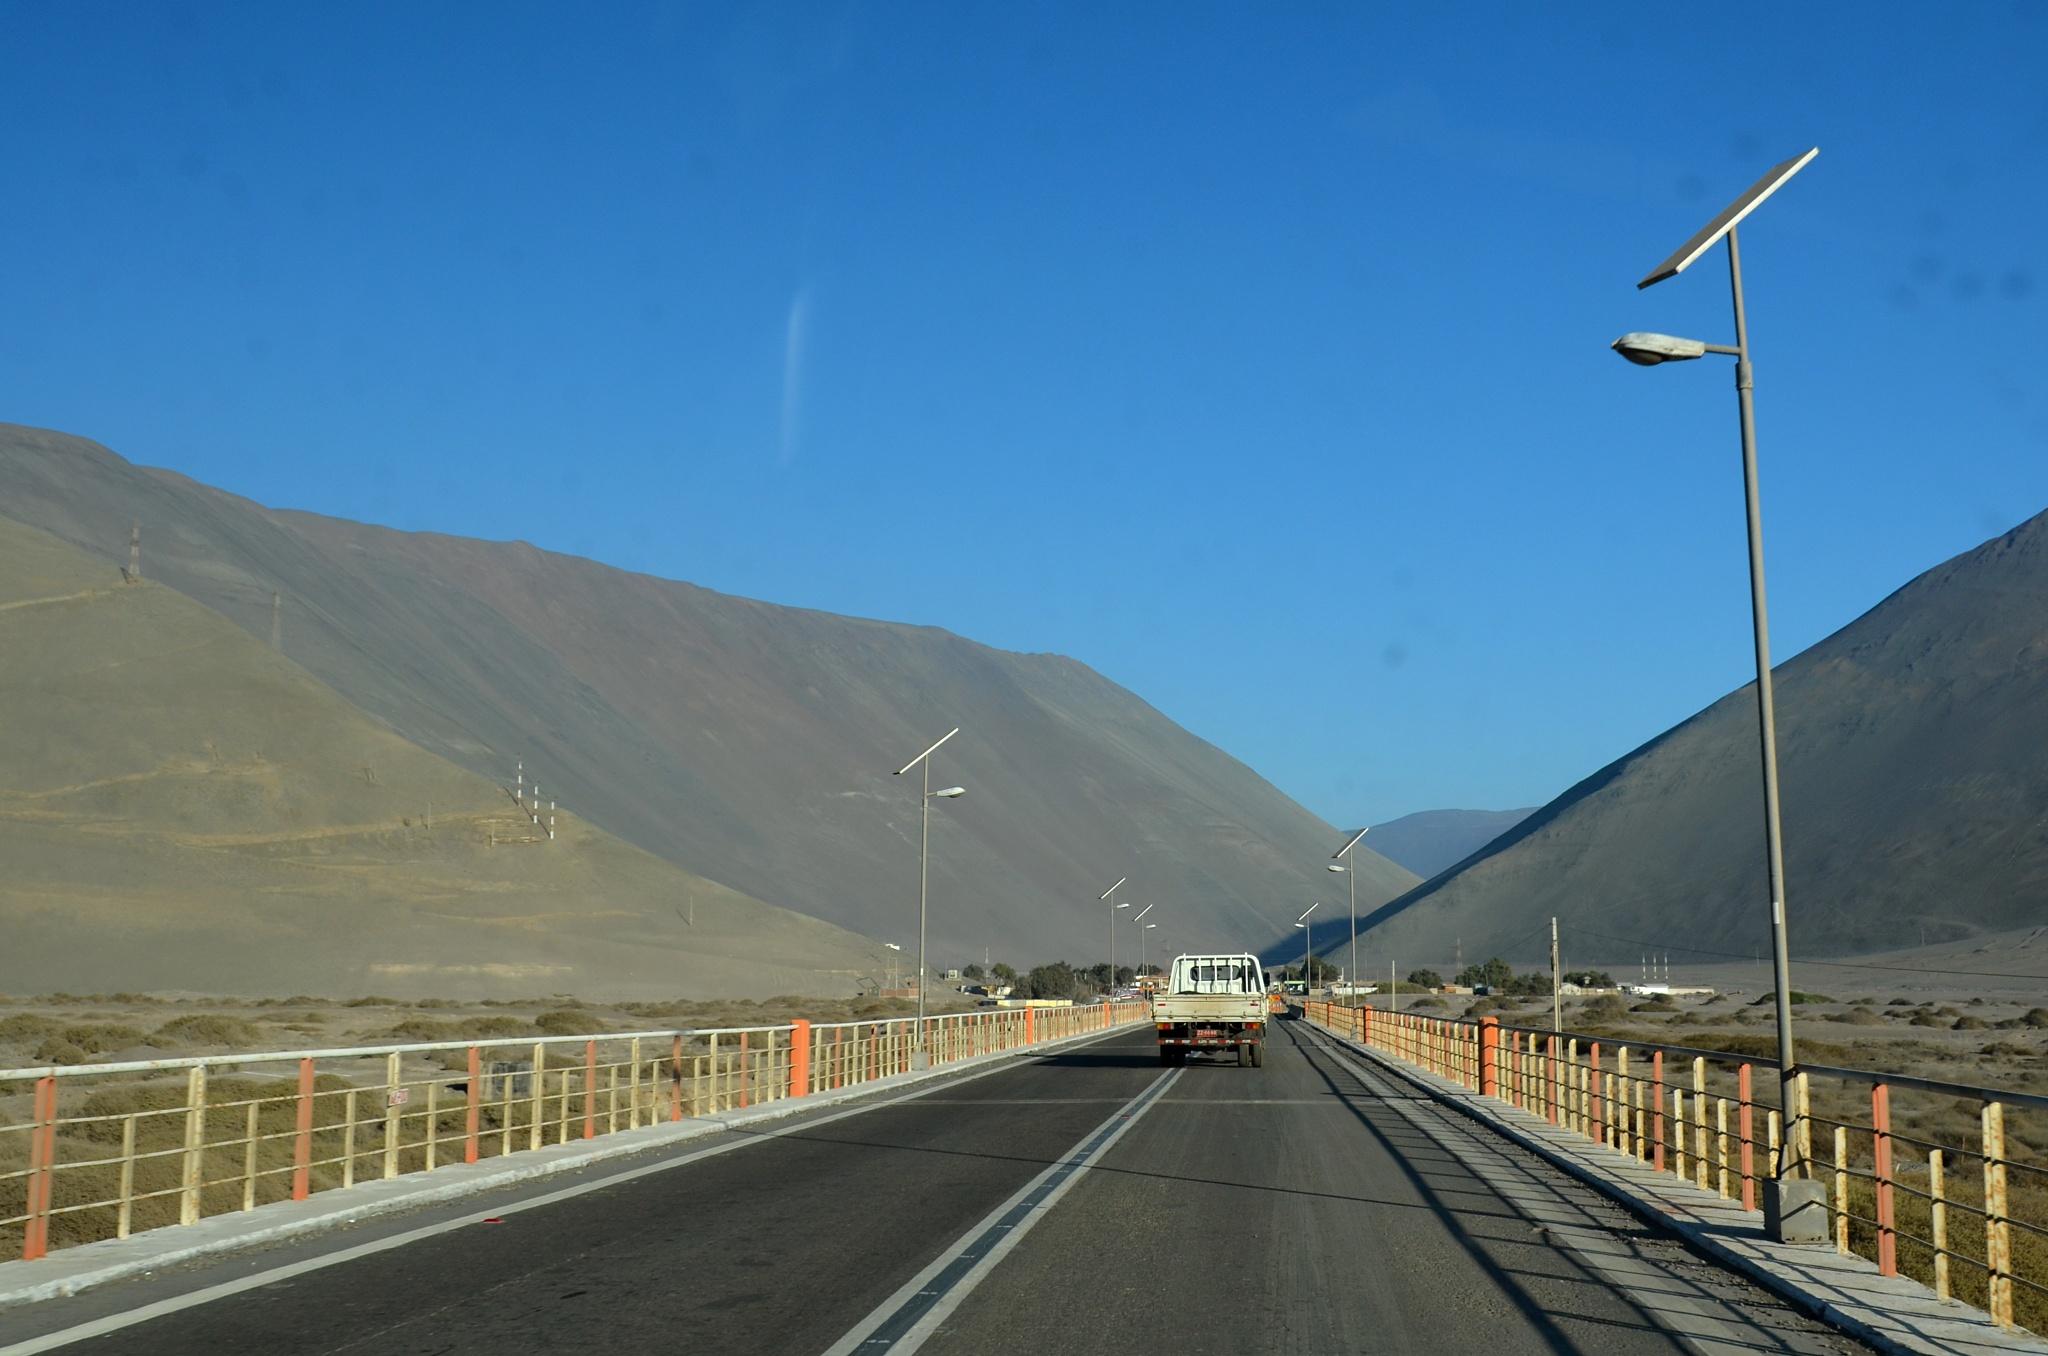 Překračujeme hranici kraje do Tarapaky